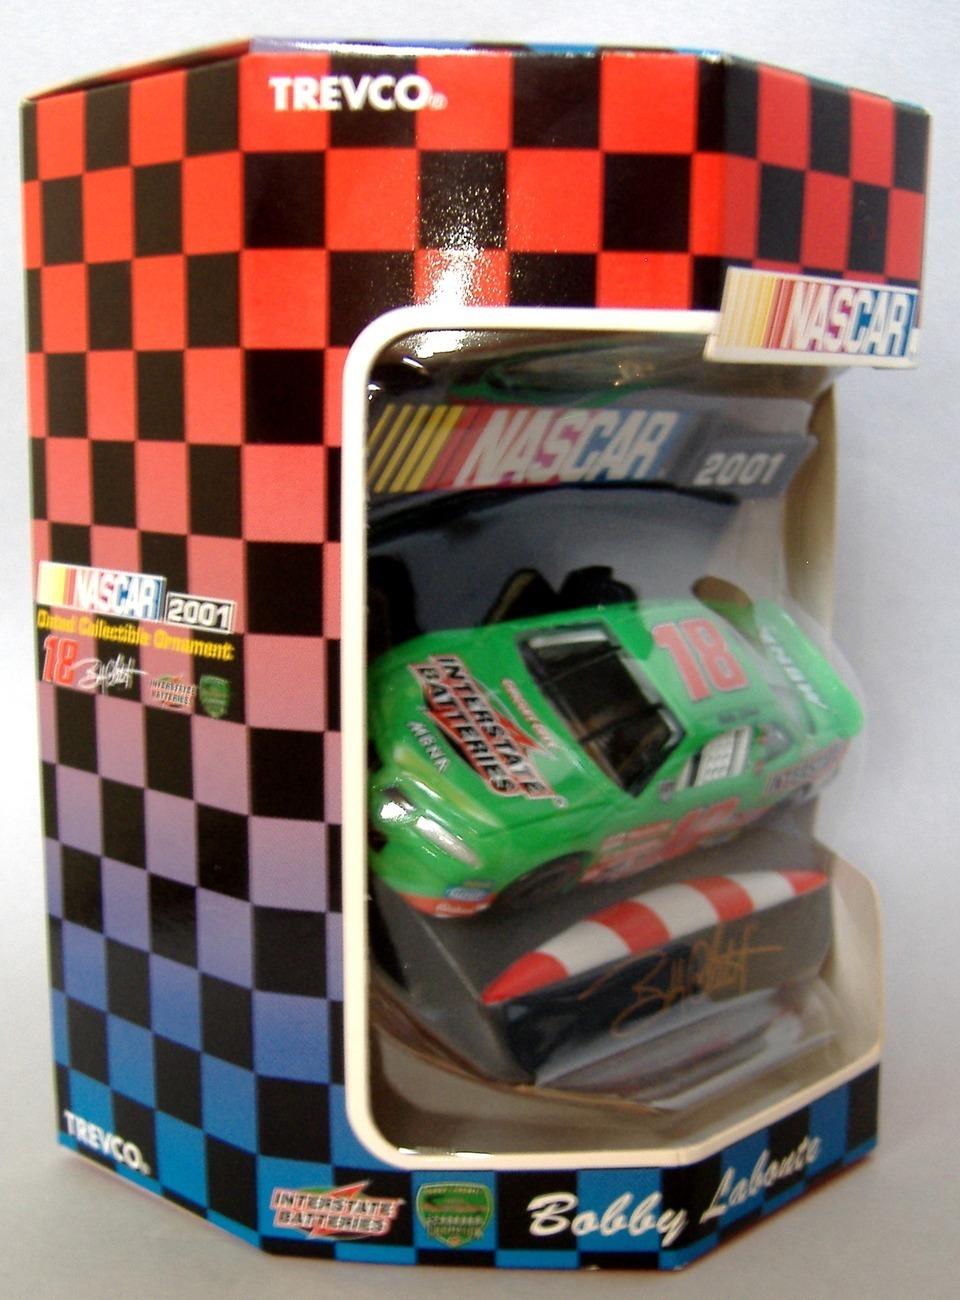 Collectible Nascar Ornament 2001 Bobby Labonte #18 Race Car Christmas Keepsake